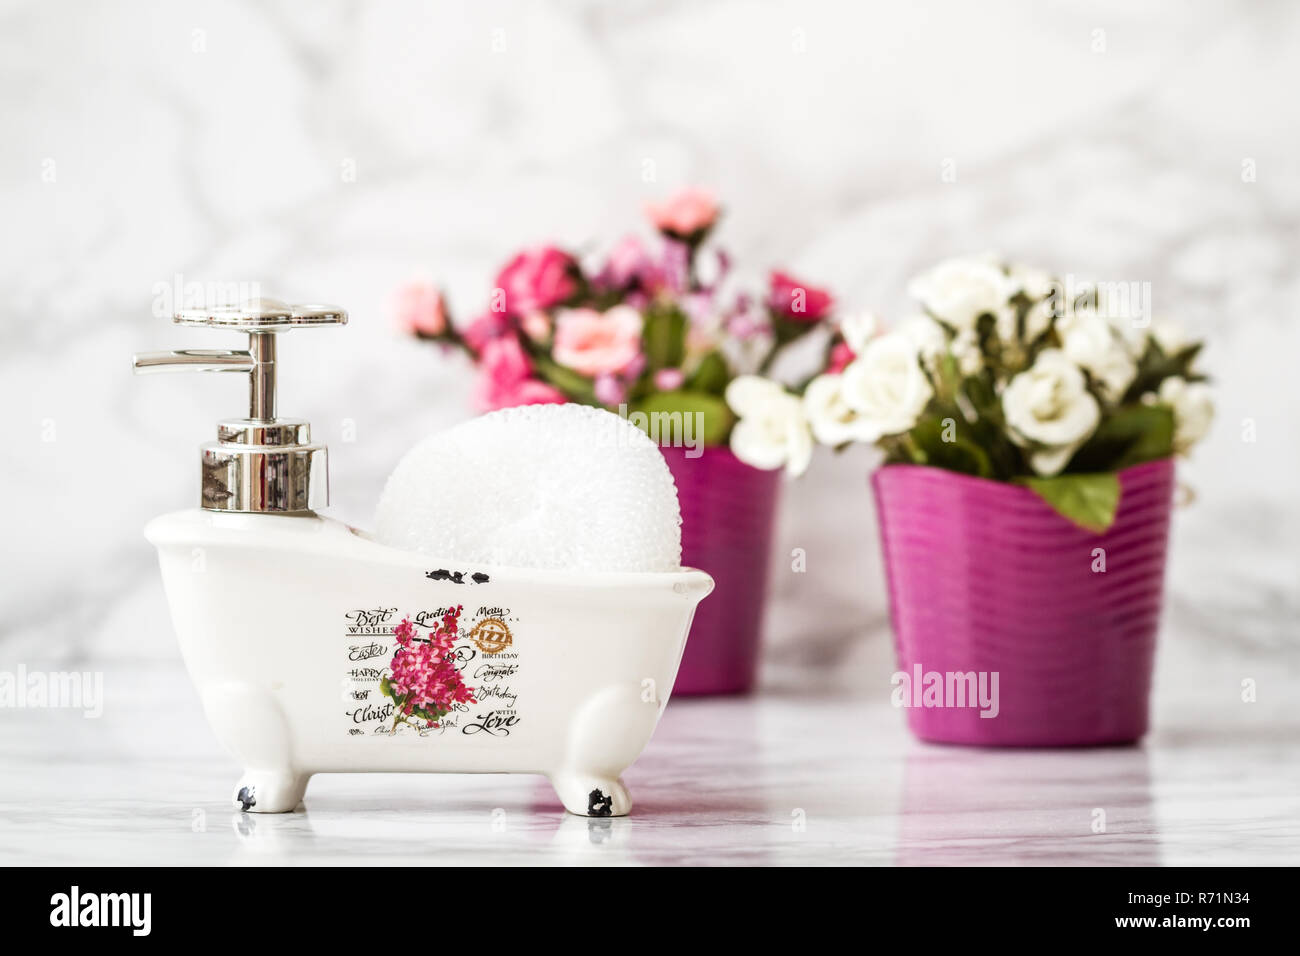 Decorative Ceramic Mini Claw Foot Bathtub Soap Dish with Bath Sponge - Stock Image